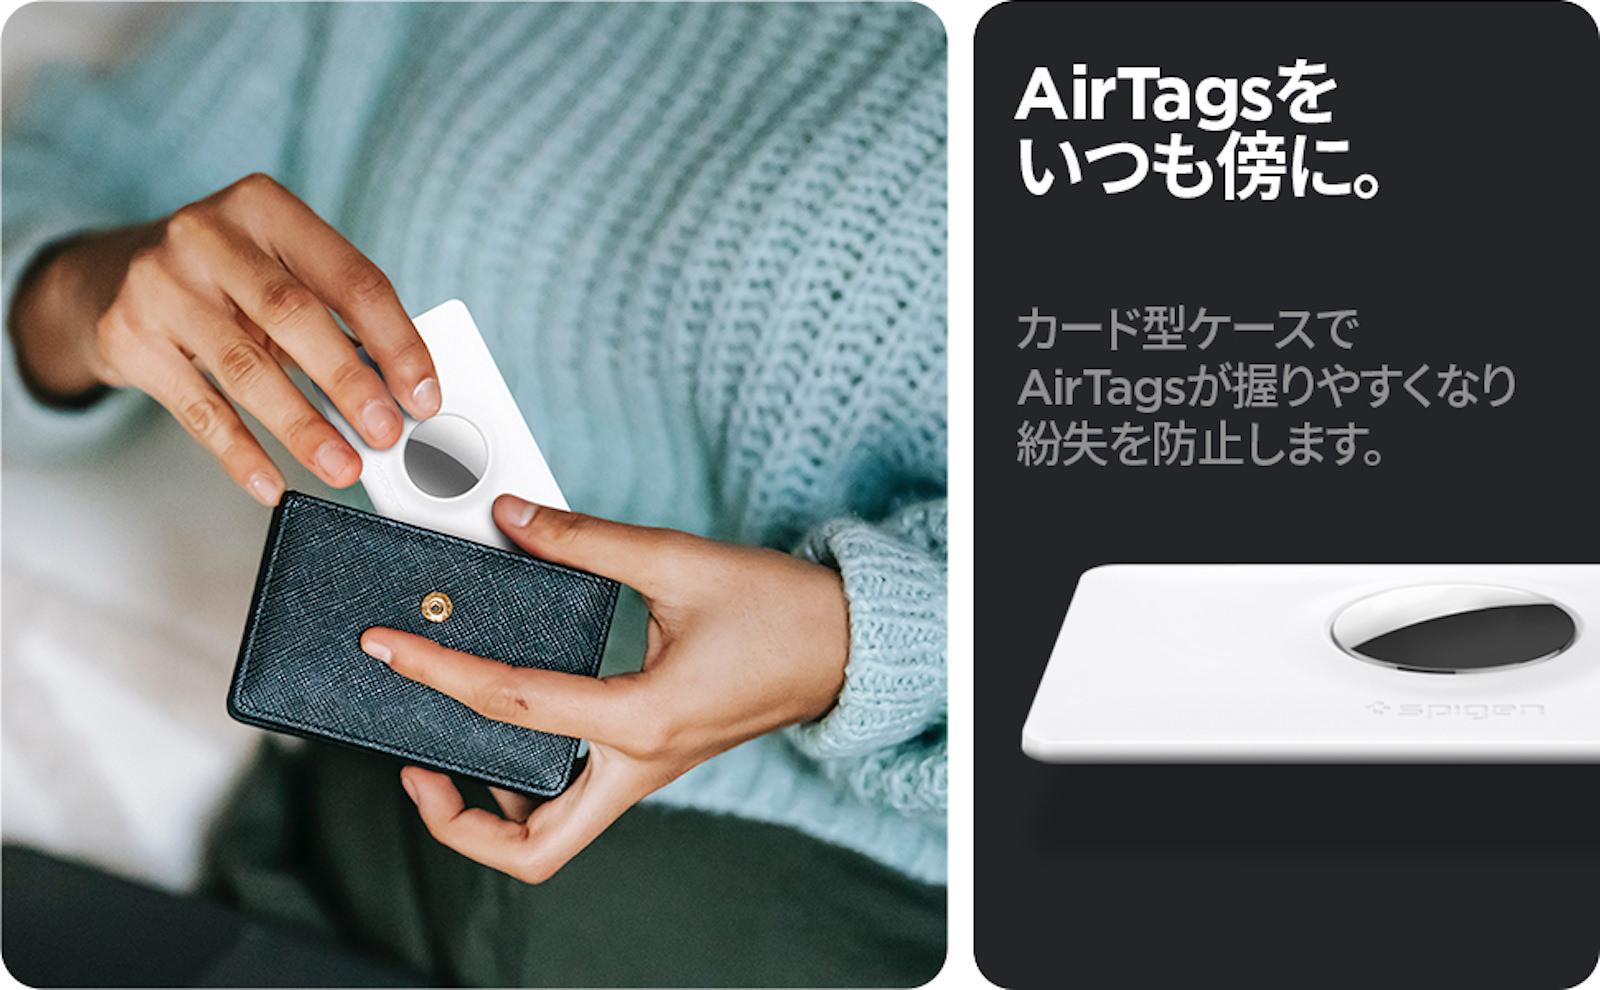 Spigen air fit airtag case 3